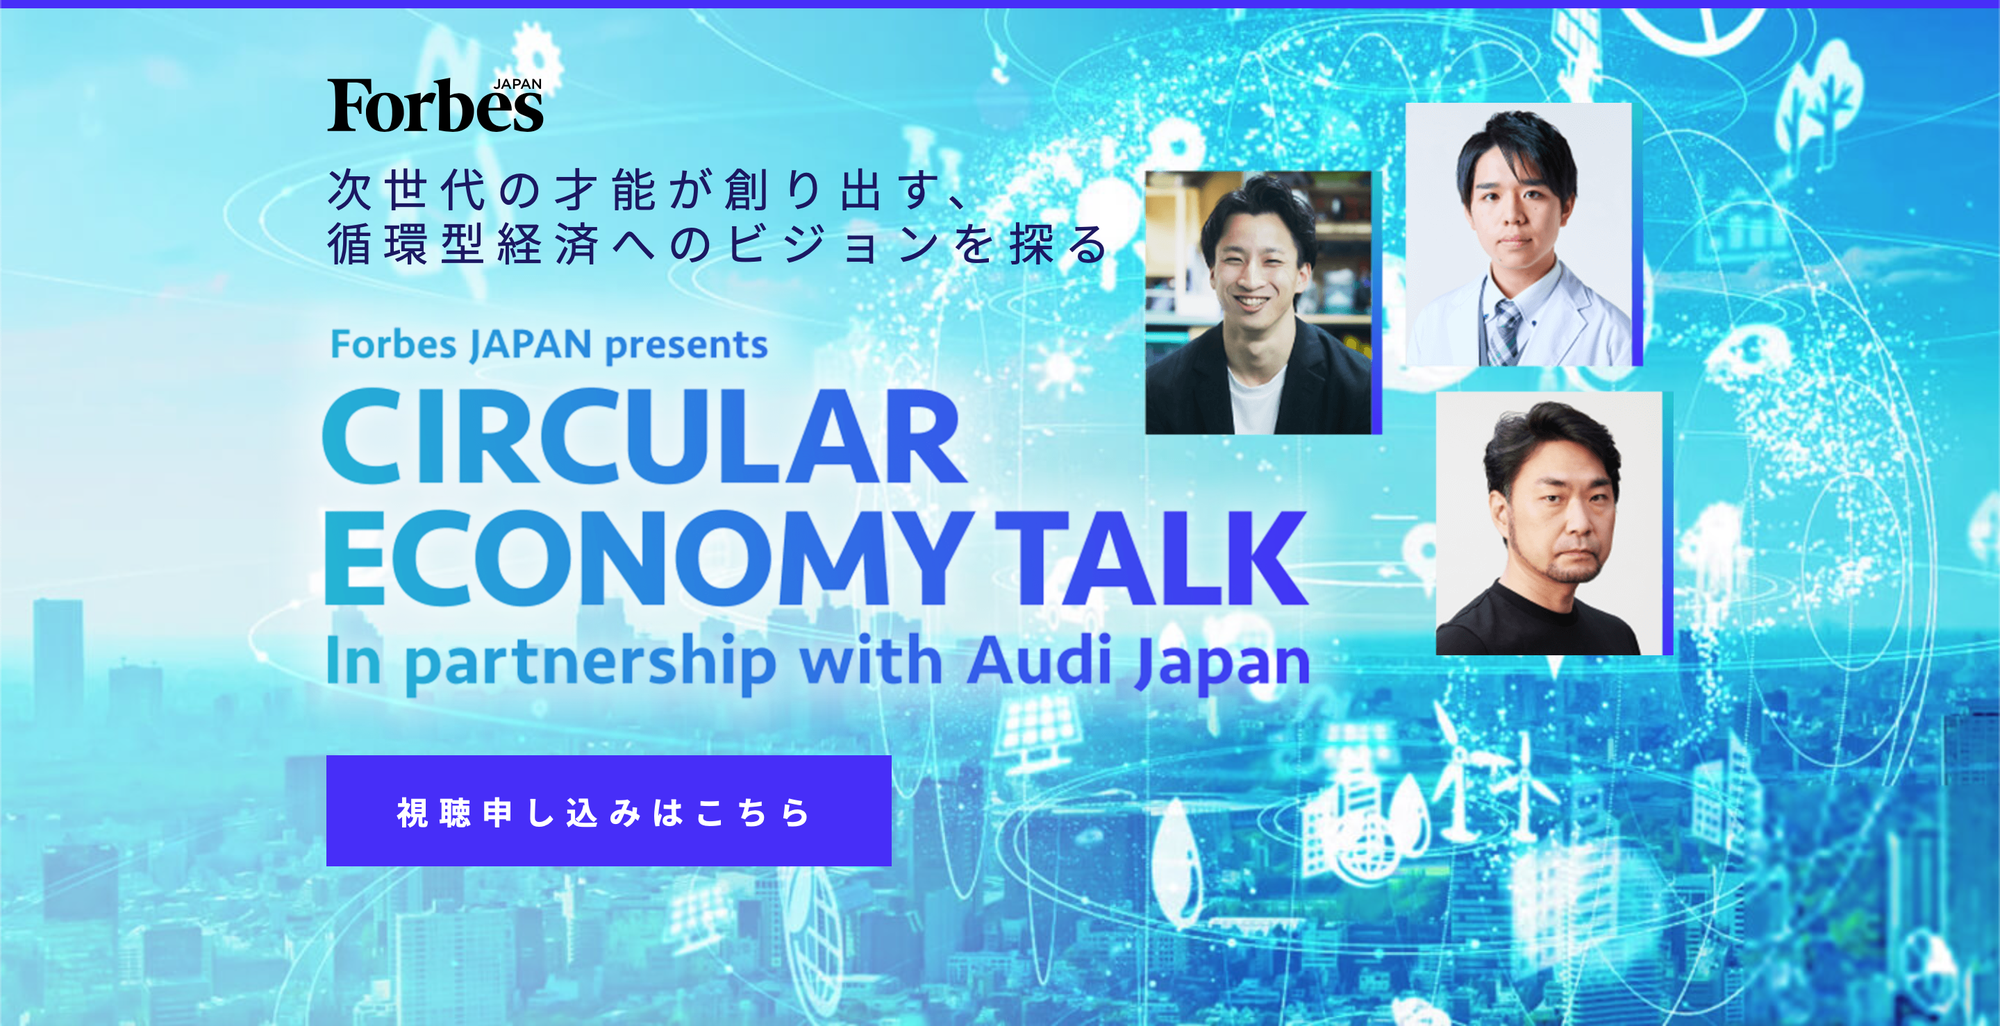 Forbes JAPAN presents CIRCULAR ECONOMY TALK に村木風海機構長が登壇予定!